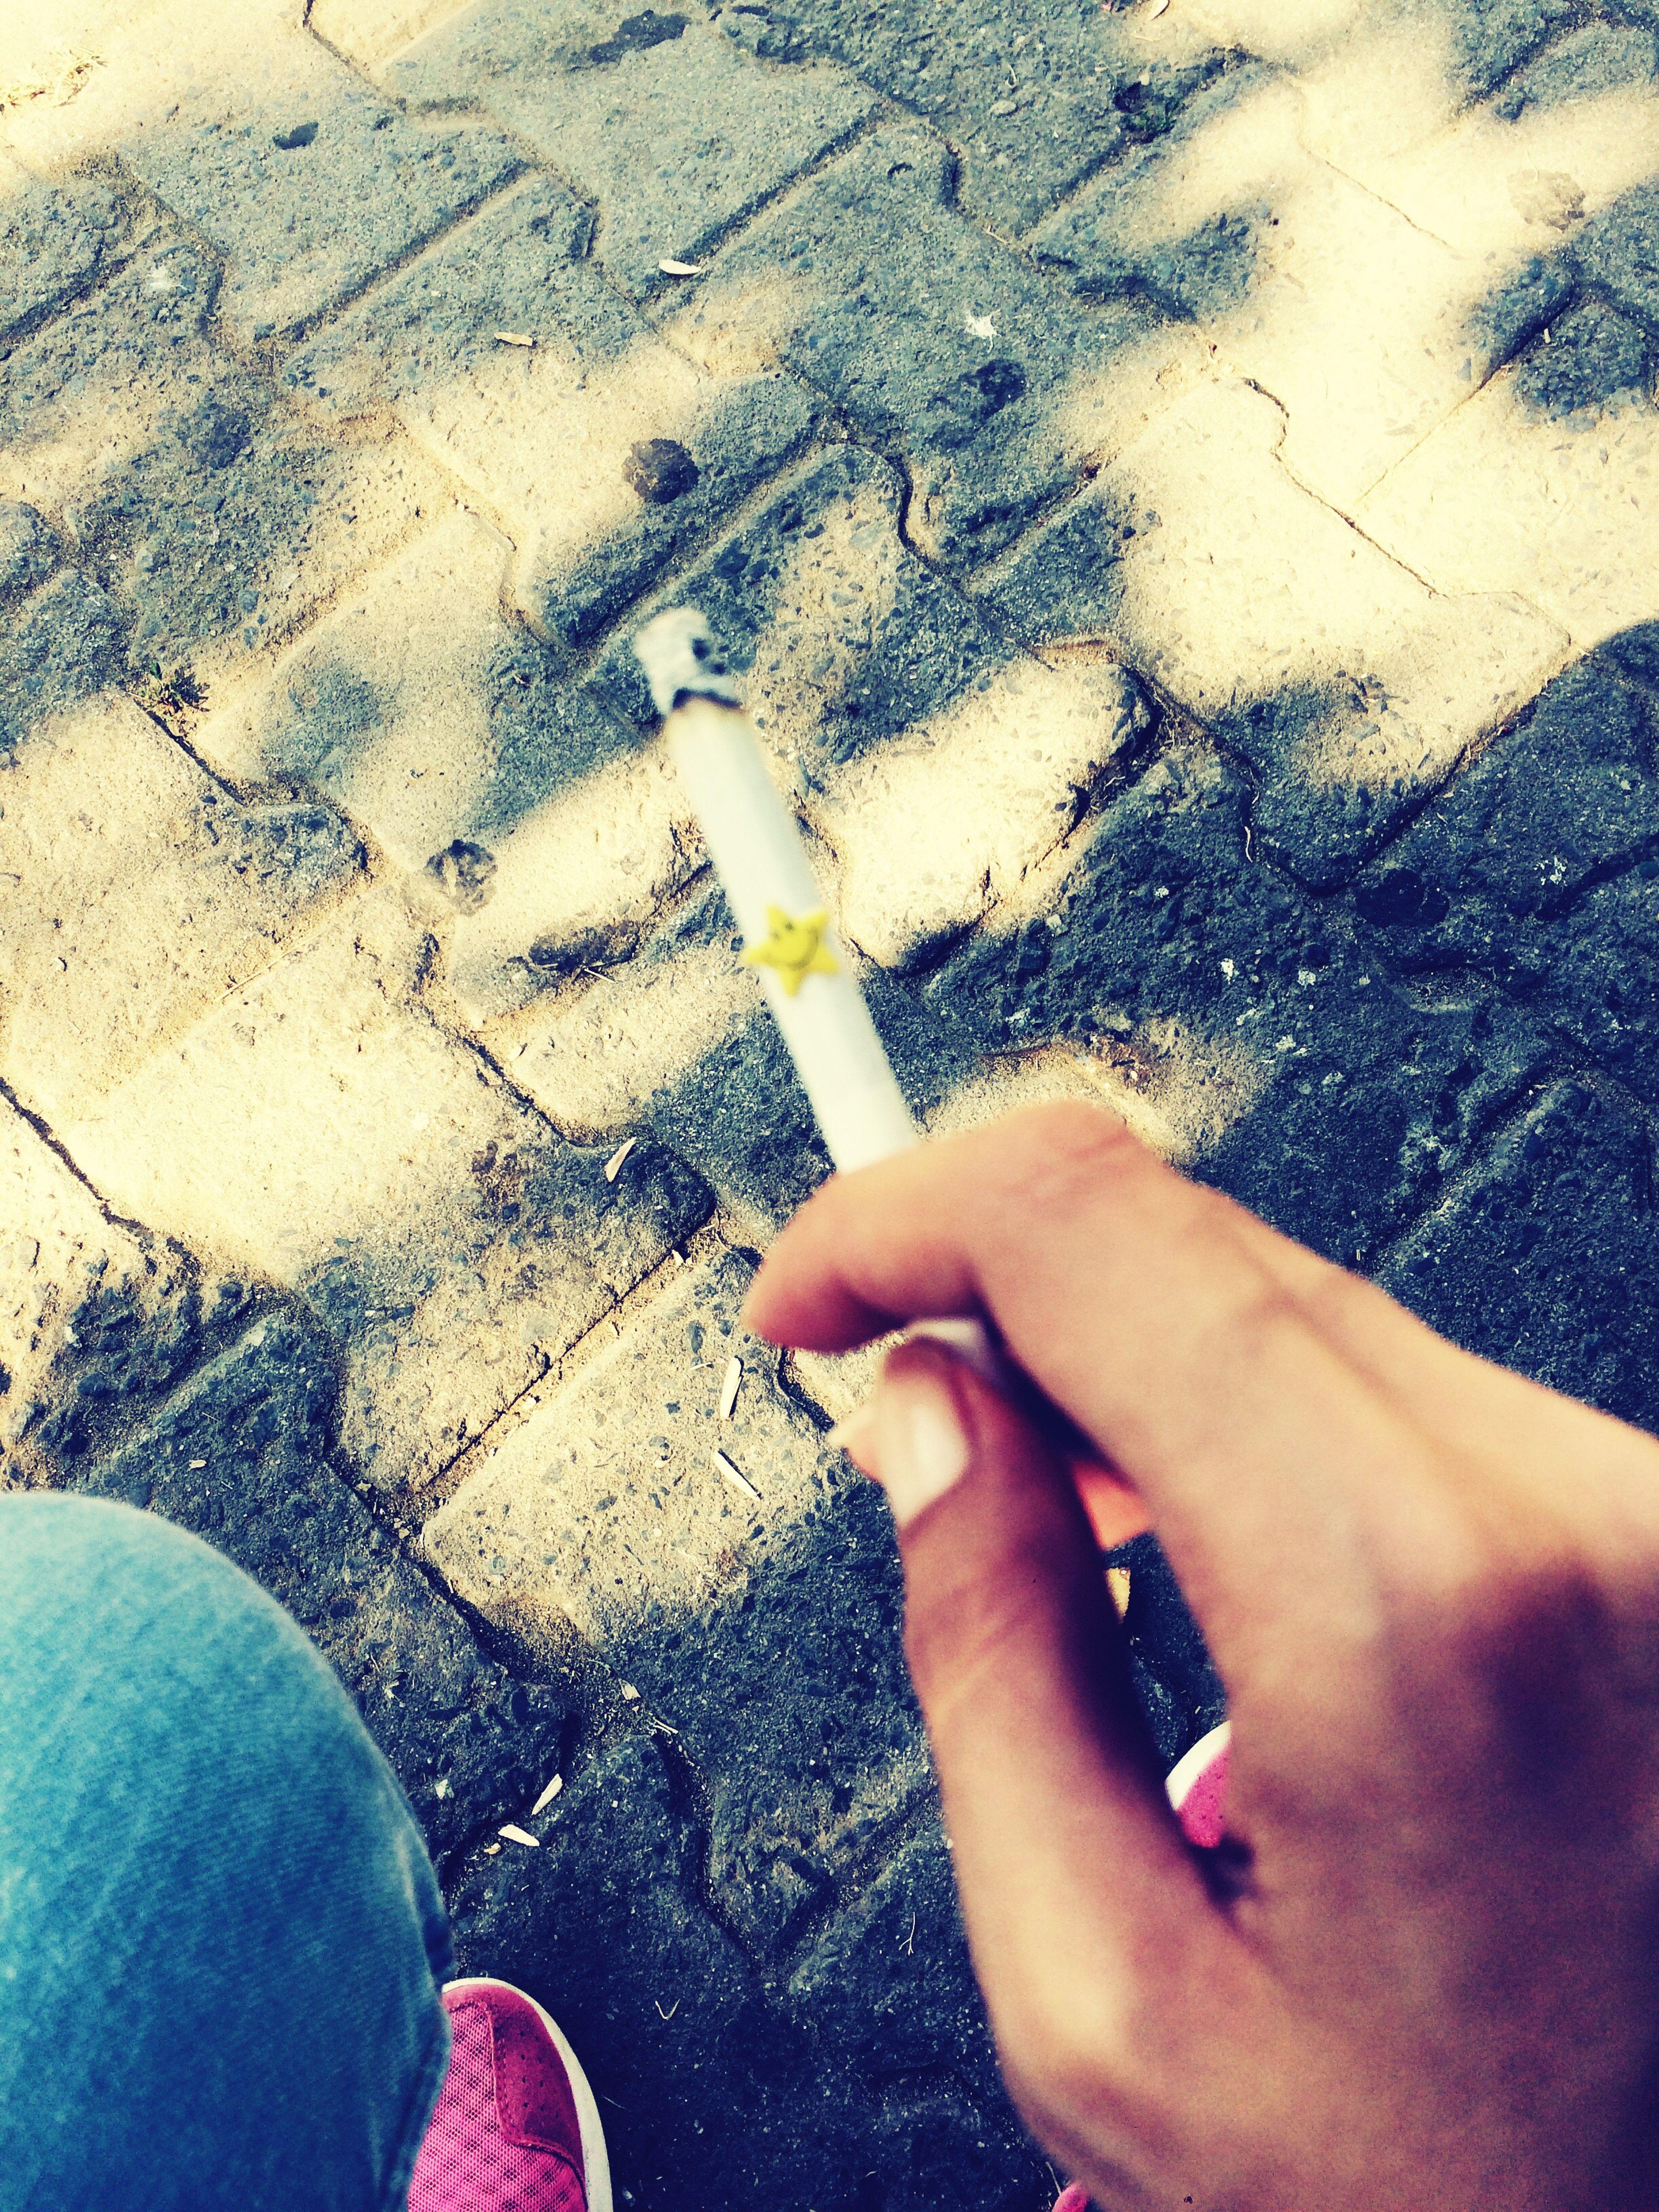 Sigarama keder olsana boşlukdan cekip alsana 🖕🏻😈